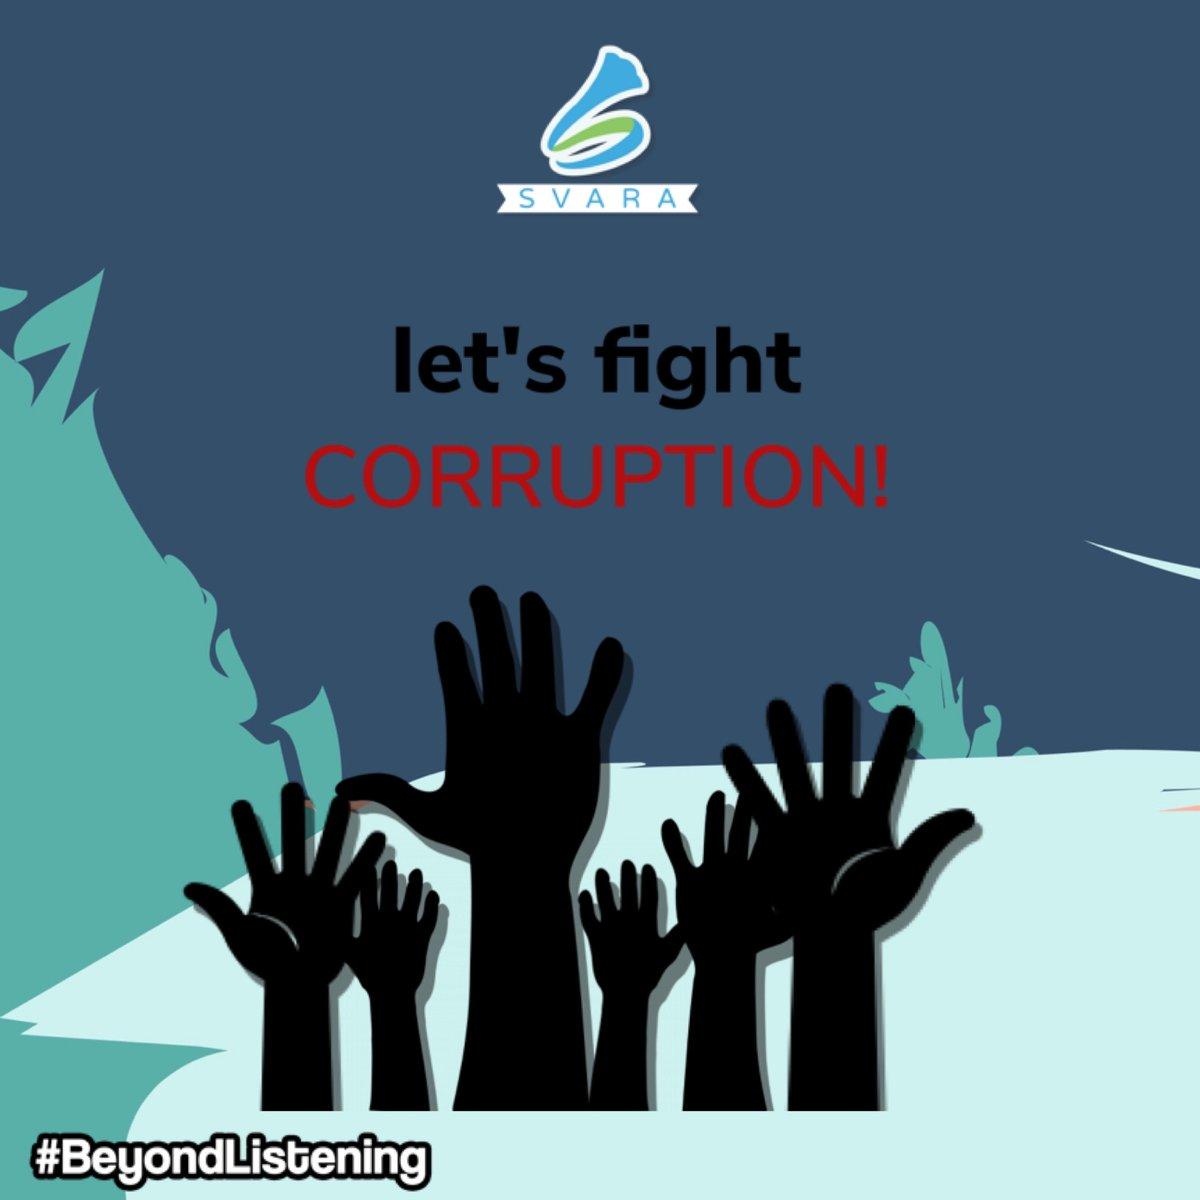 Ayoo Svaranian mari kita bersatu padu, berpegang erat pada hati nuranikita untuk katakan tidak pada korupsi. Melakukan korupsi sama saja dengan menghina dan merendahkan diri sendiri. Selamat Hari Anti Korupsi Sedunia. . . . #SVARA #beyondlistening pic.twitter.com/WLzobbltyK